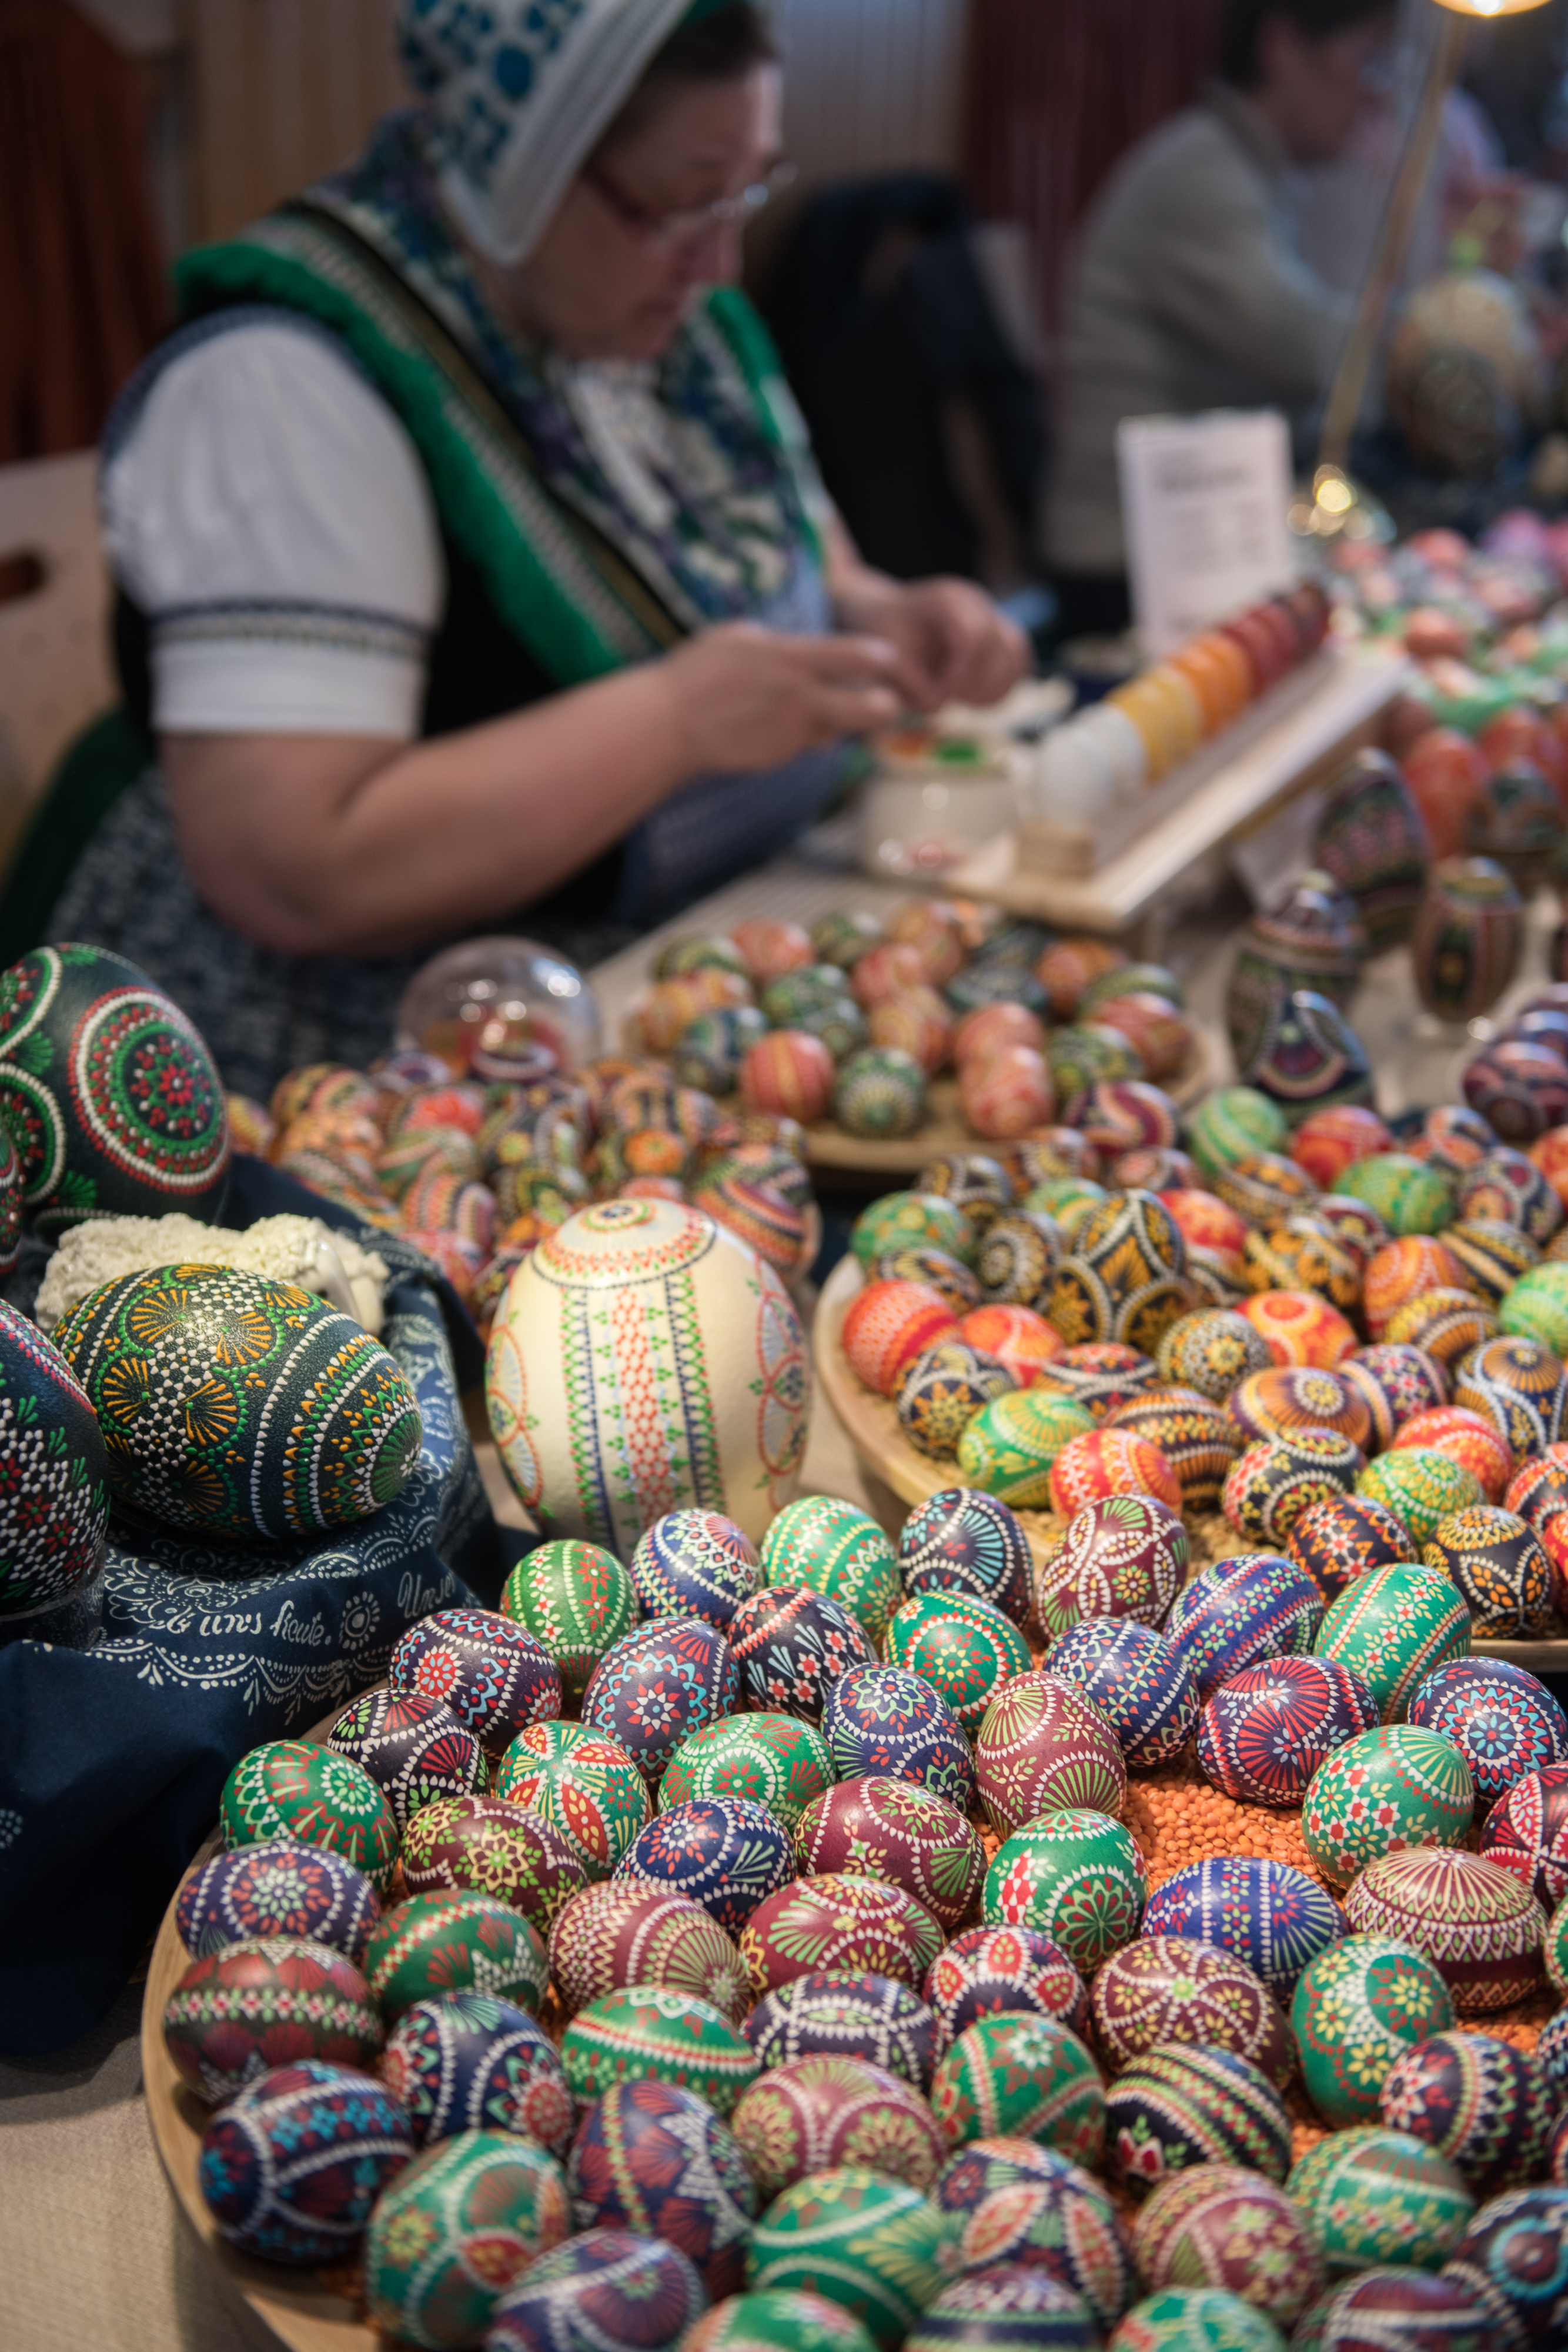 Why Easter never became a big secular holiday like Christmas